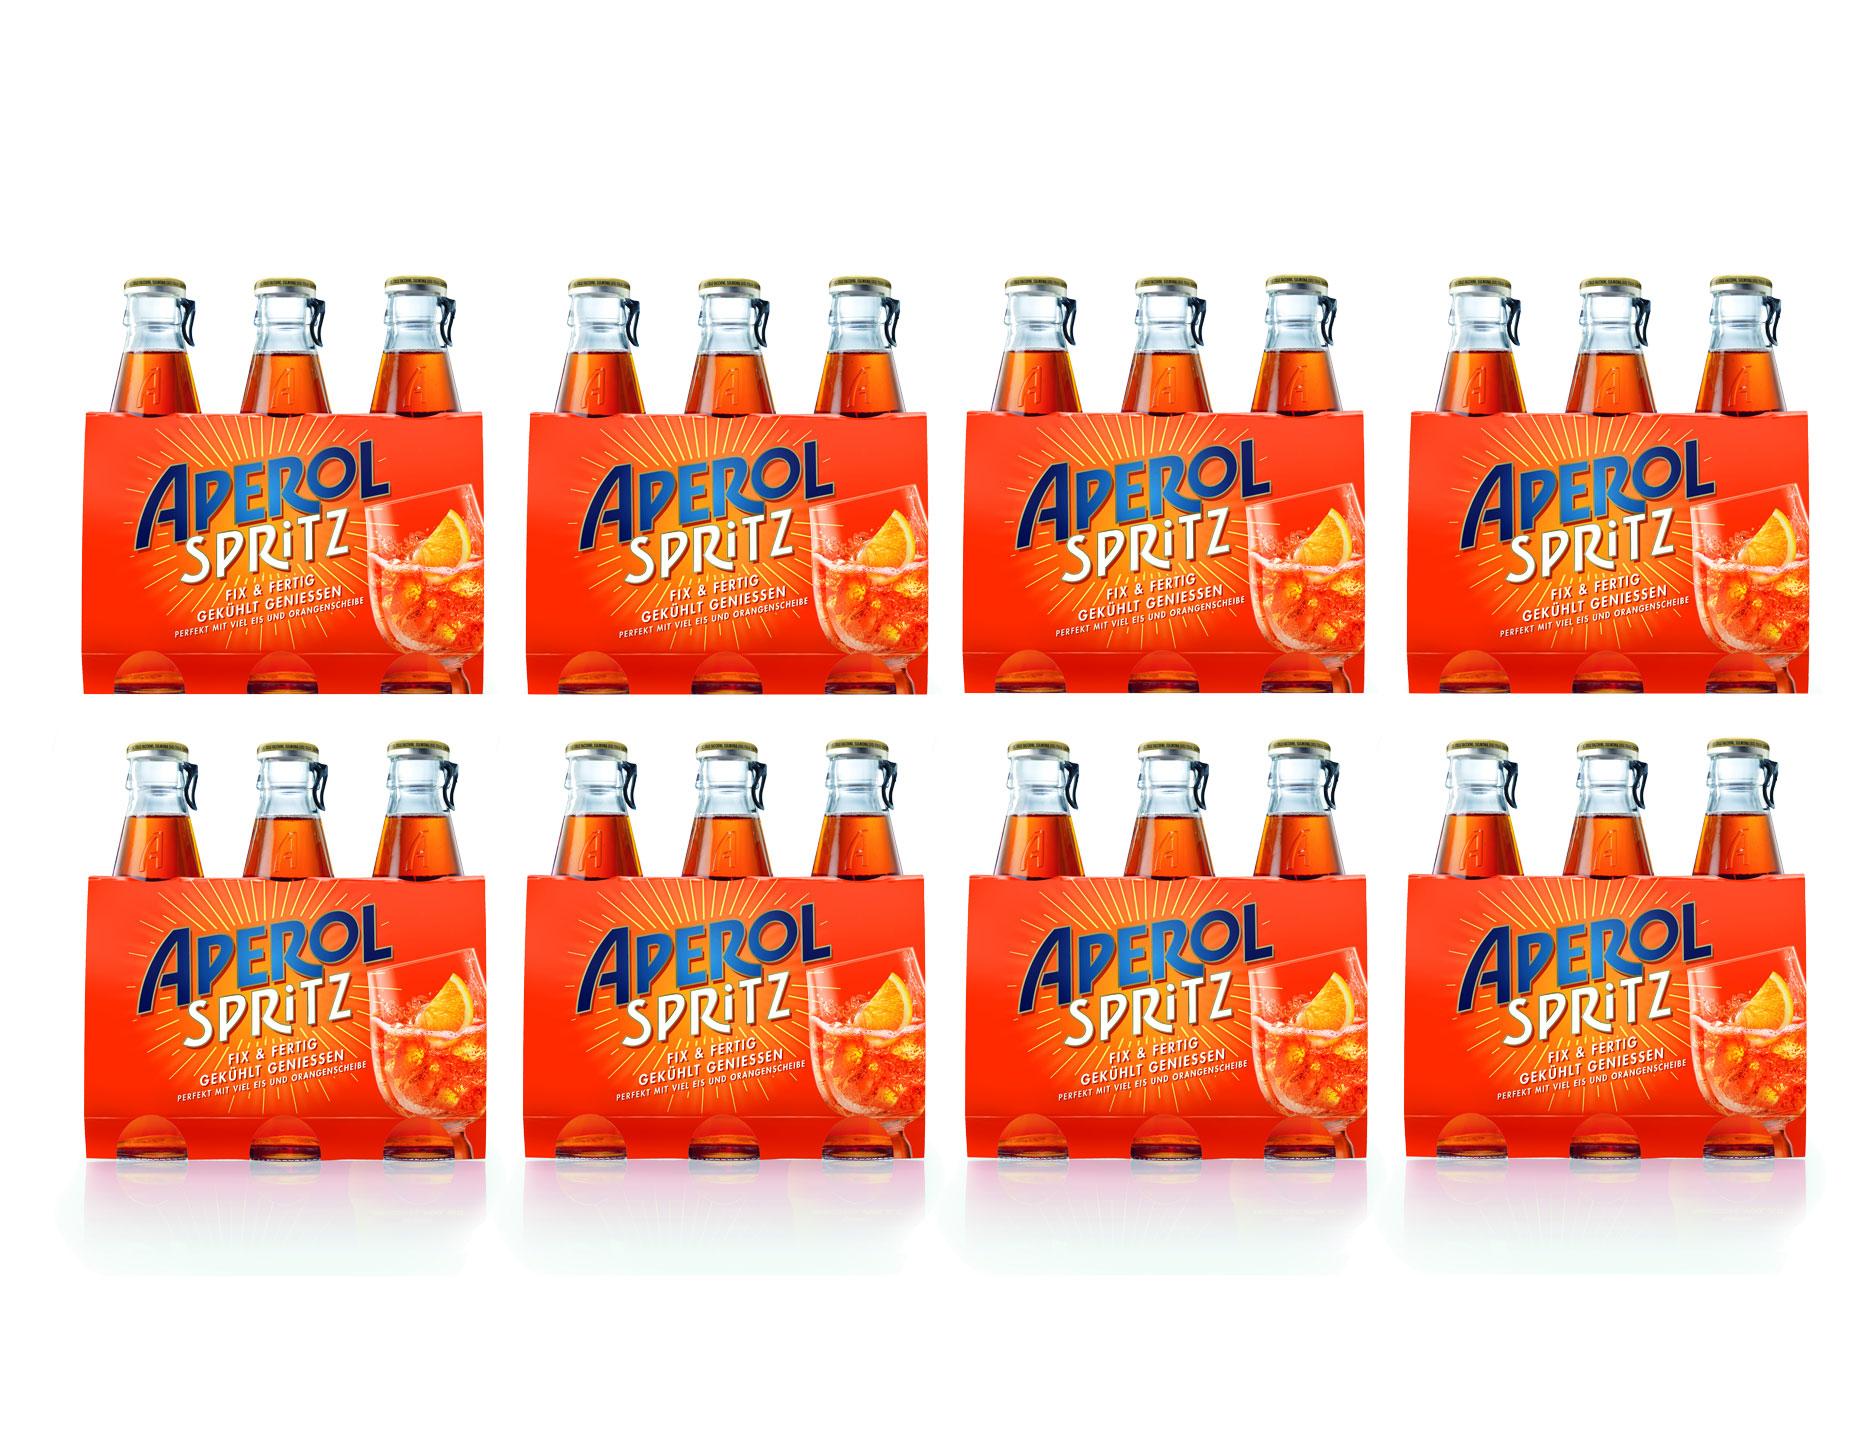 Aperol Spritz 24x 17,5cl (10,5% Vol) ready to drink Aperitivo / Aperitif - [Enthält Sulfite]